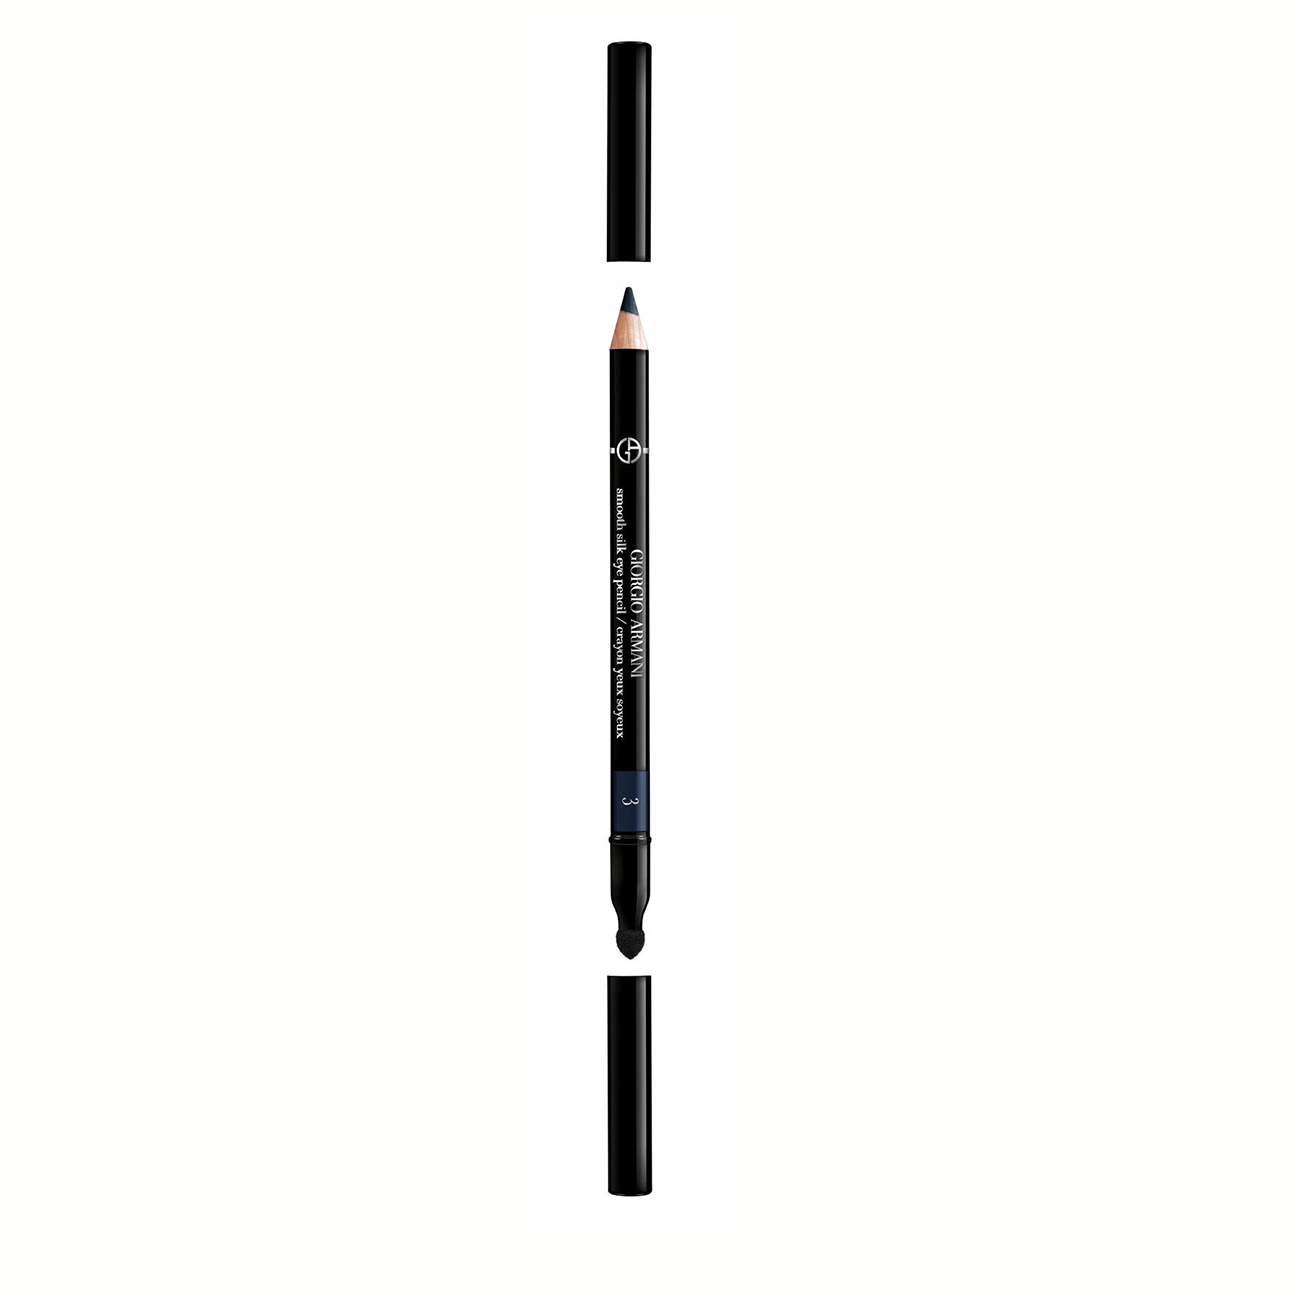 Smooth Silk Eye Pencil 3 1.05gr Giorgio Armani imagine 2021 bestvalue.eu